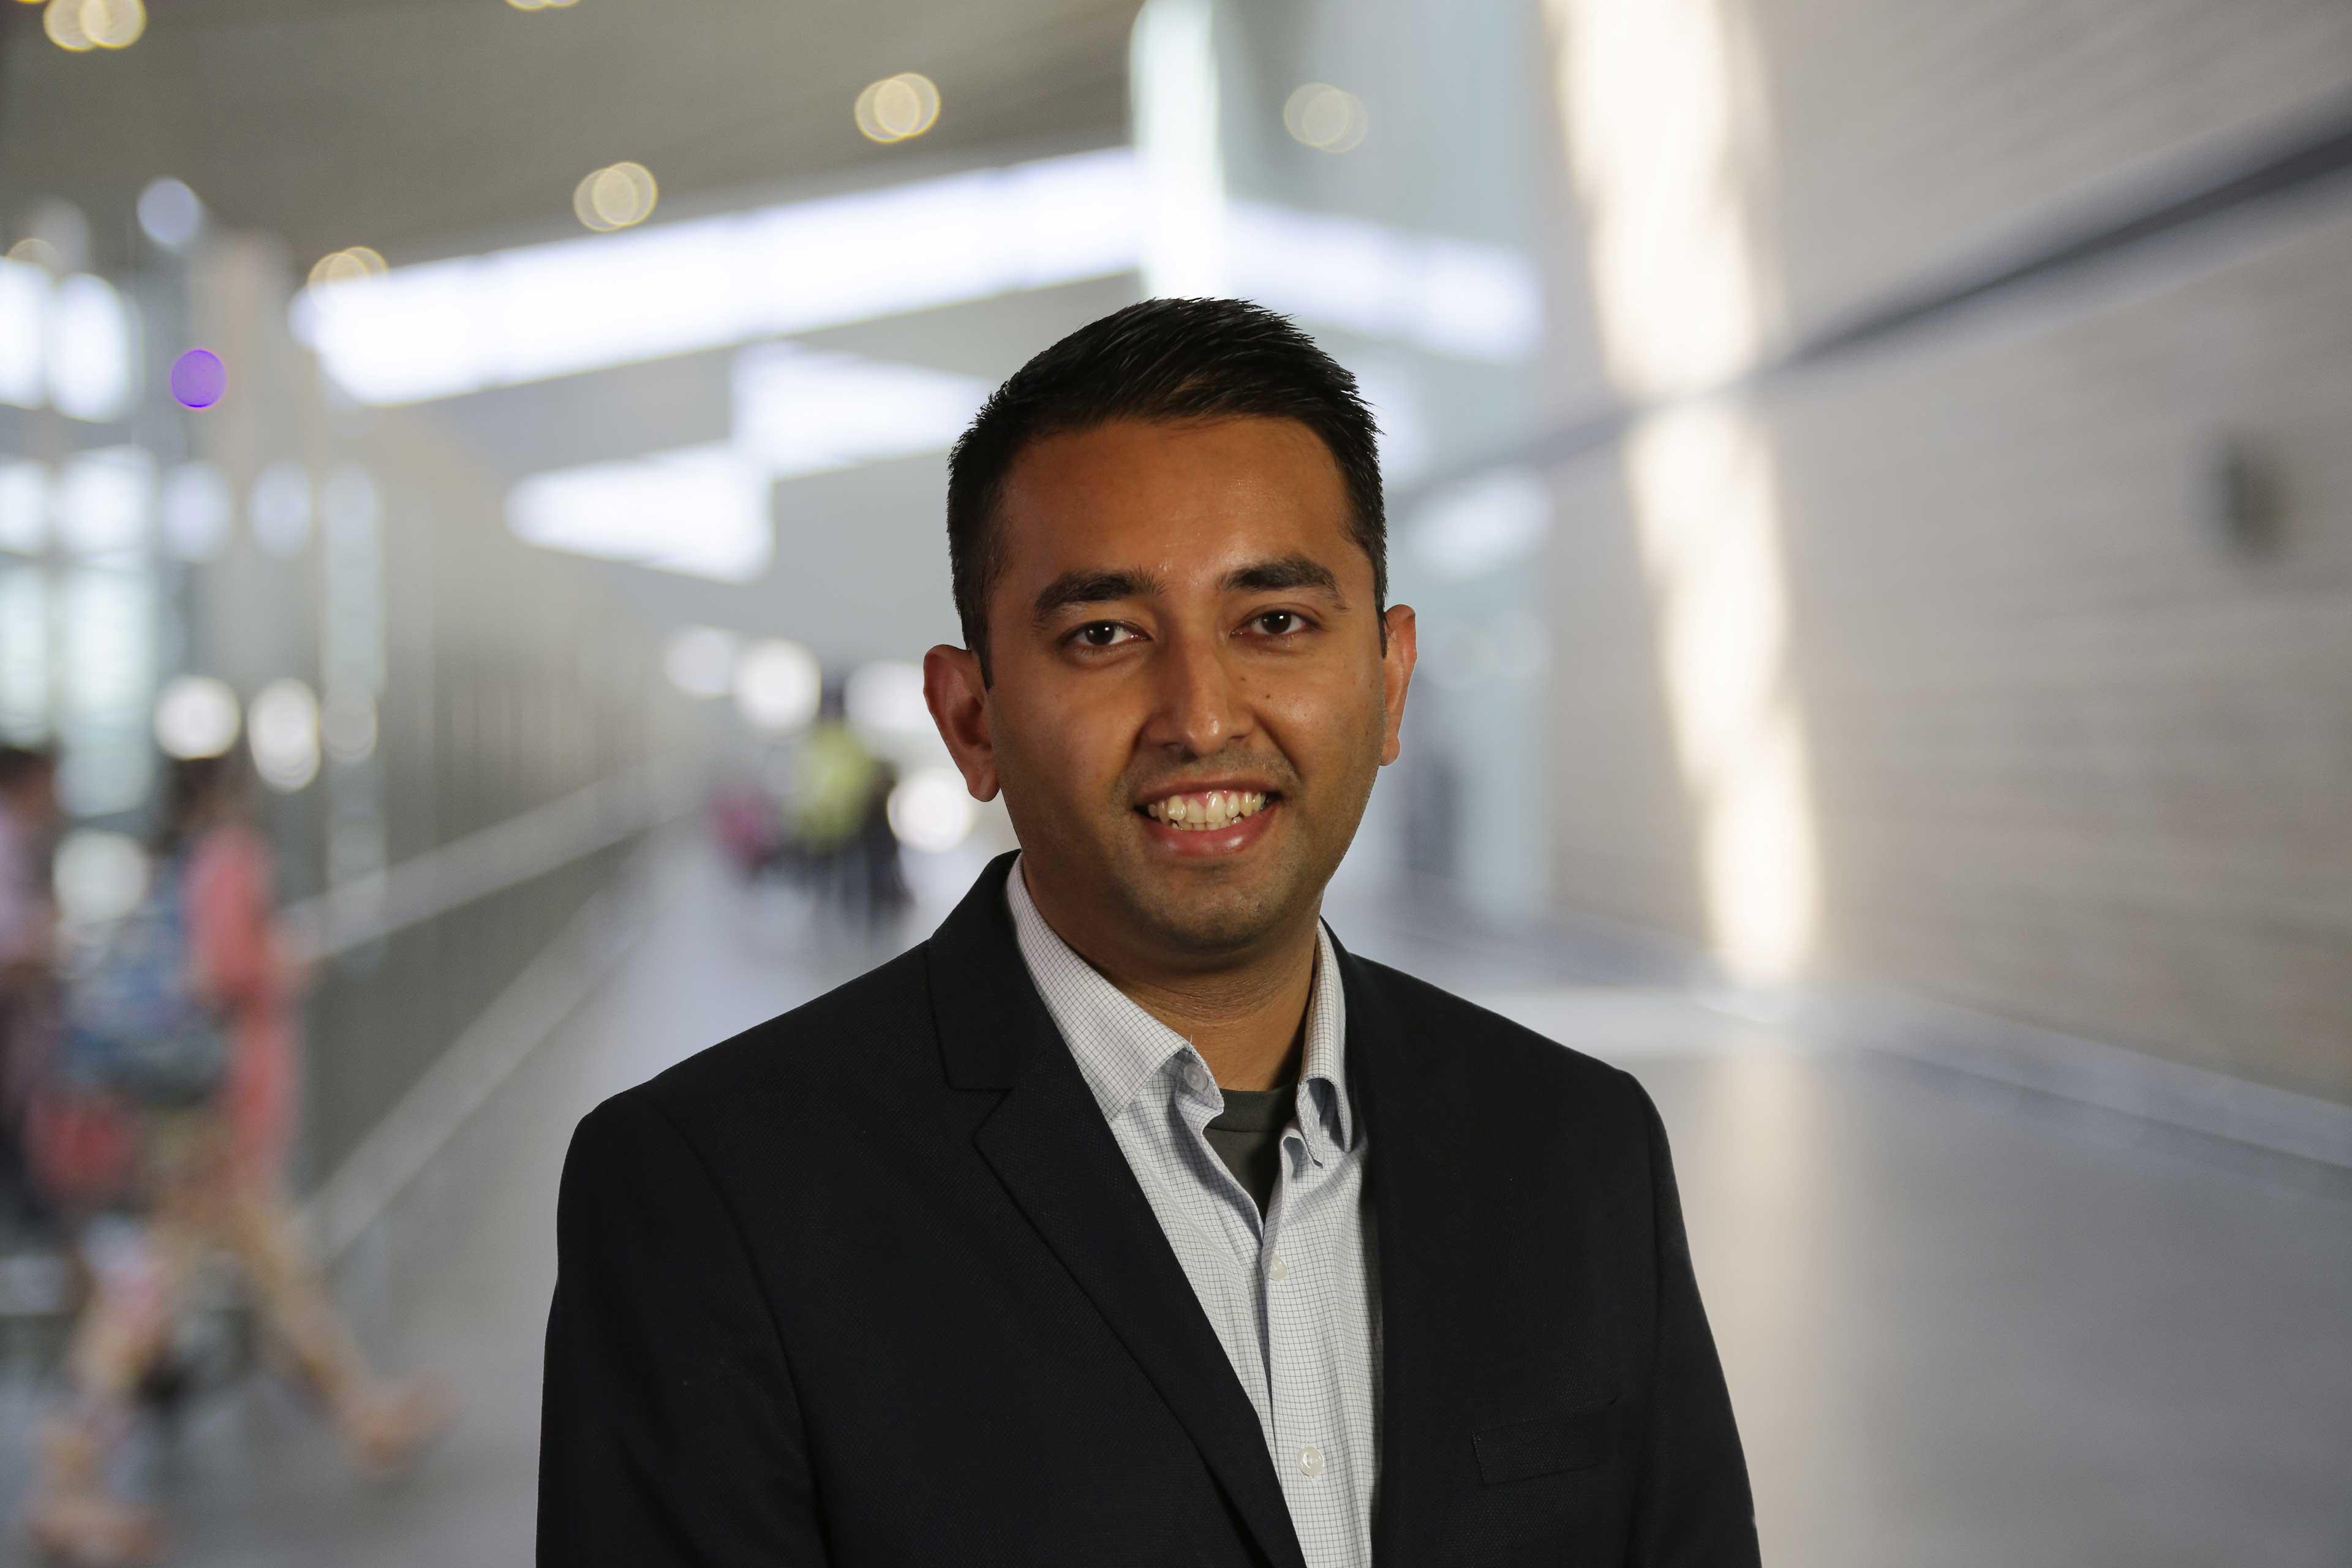 Dhruv Saxena | 2020 MW EOY judge